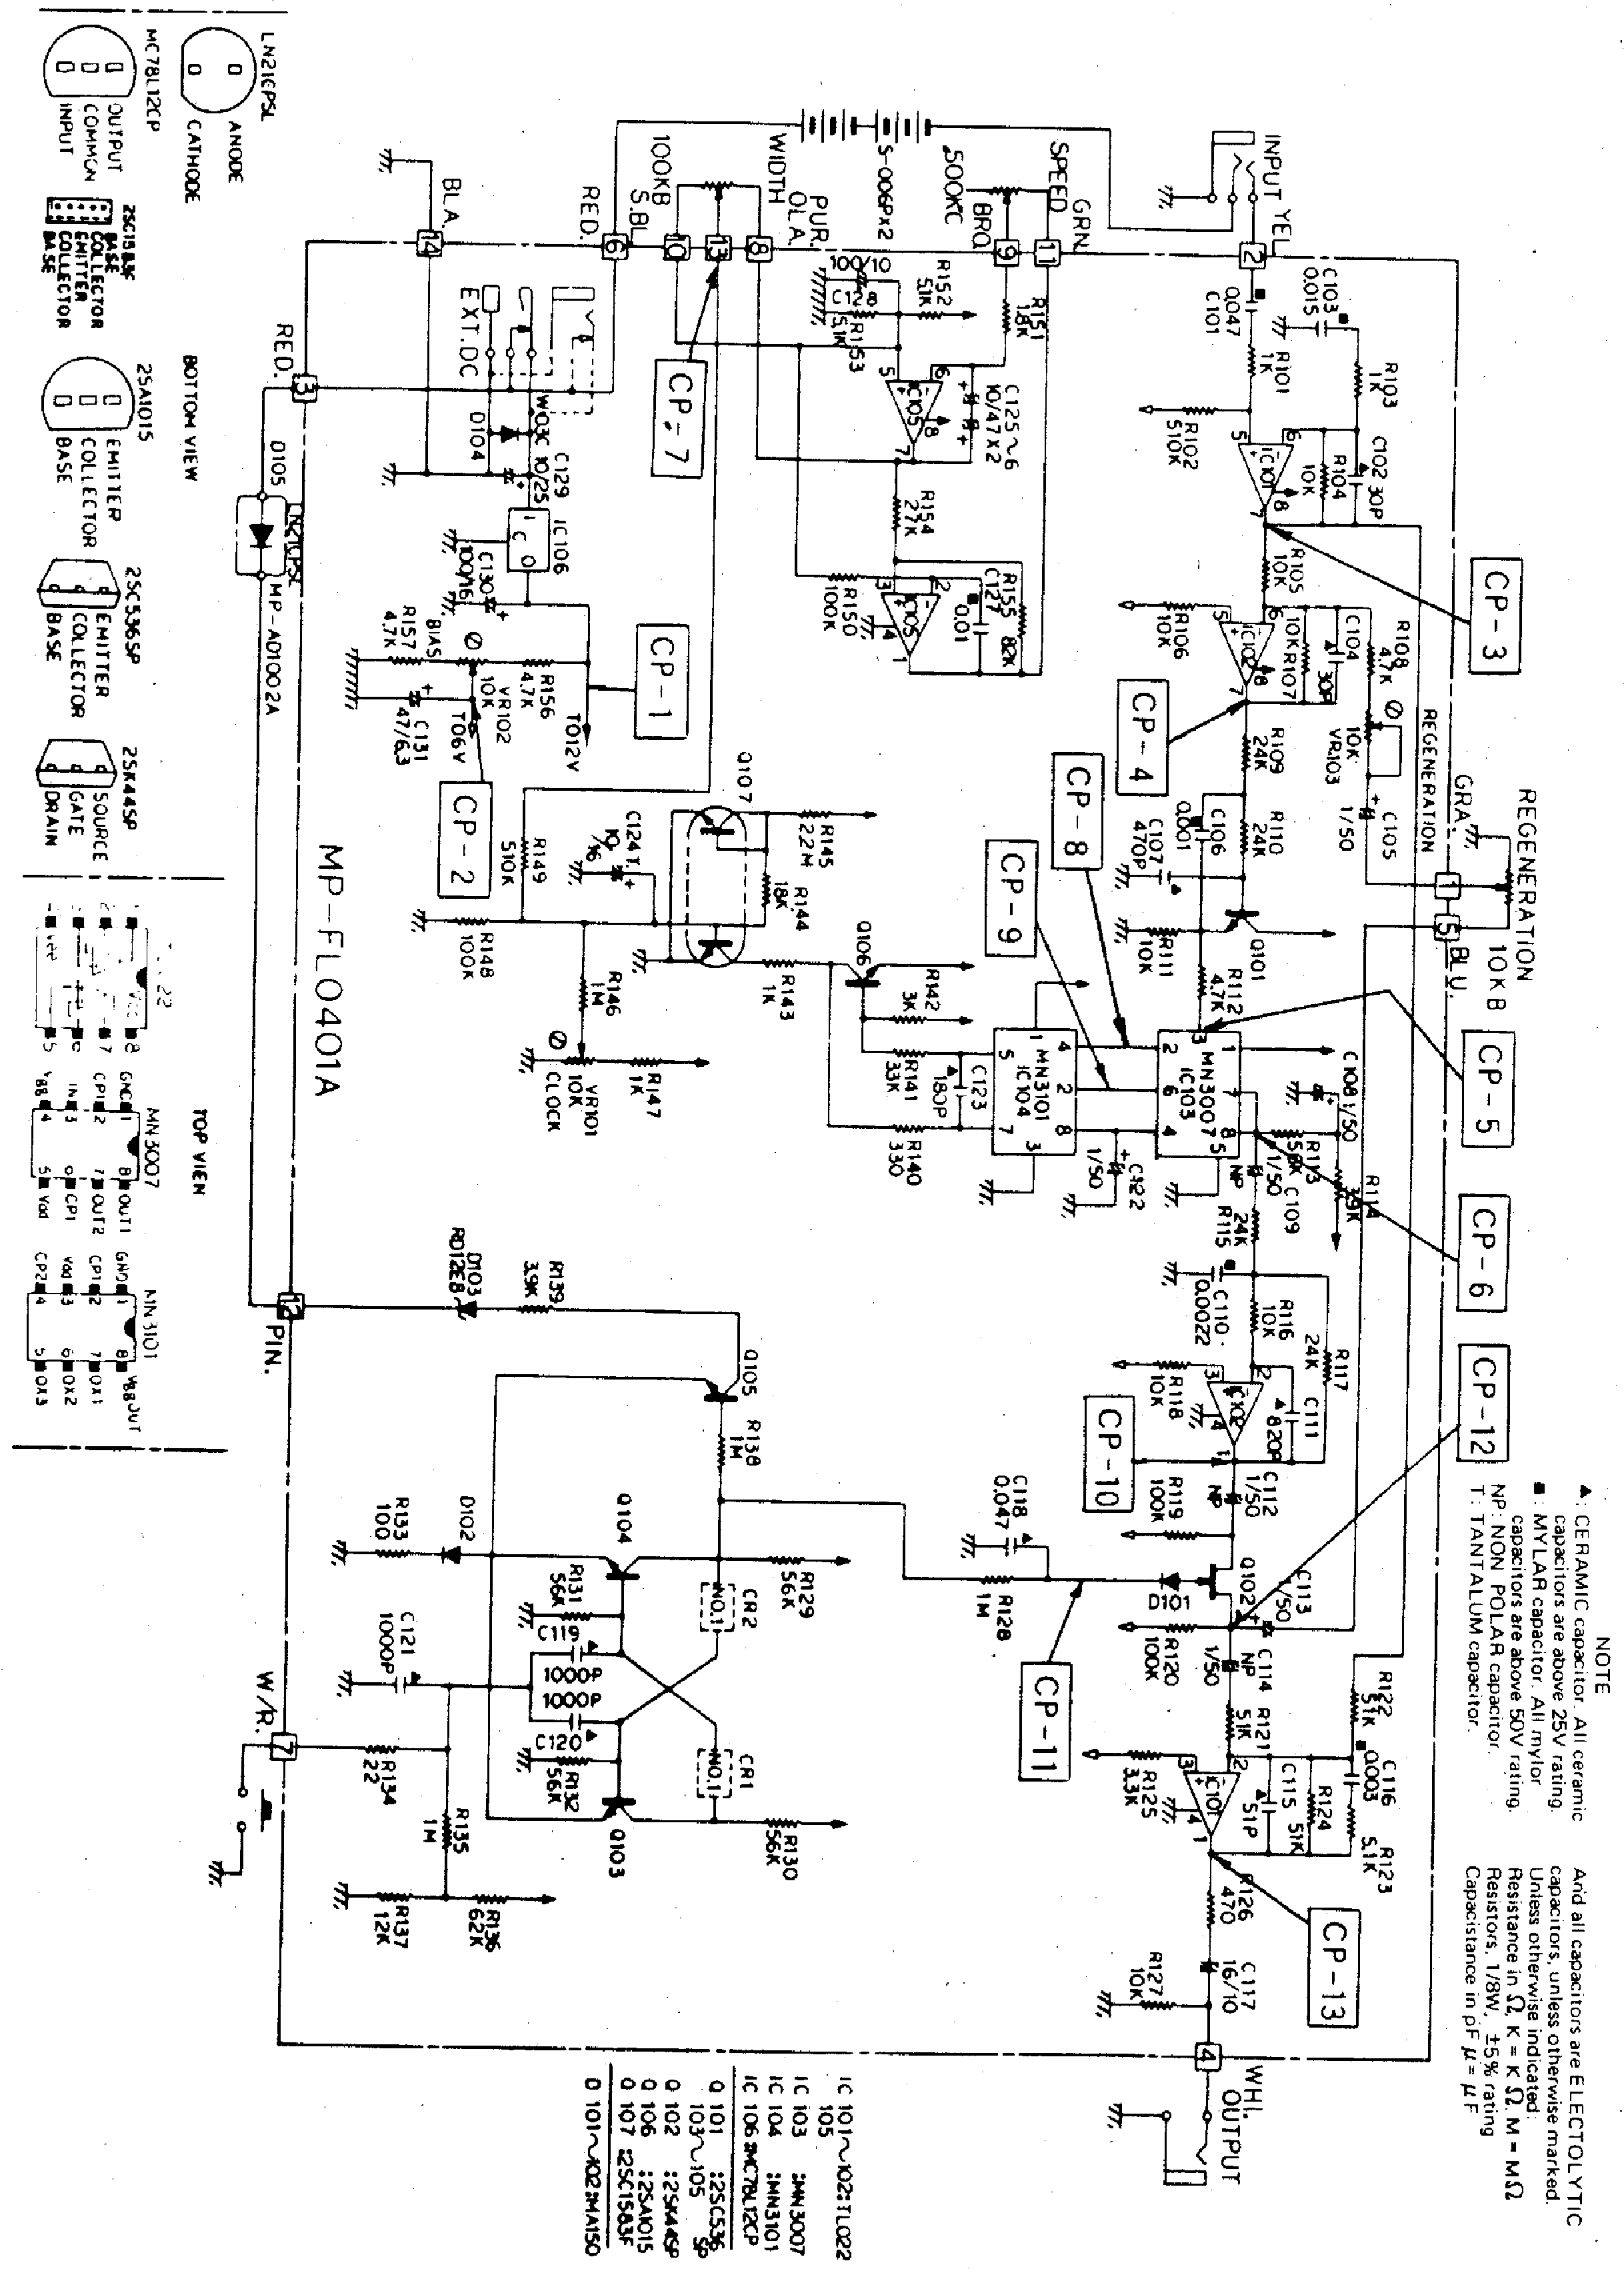 IBANEZ ST9 SCH Service Manual download, schematics, eeprom, repair